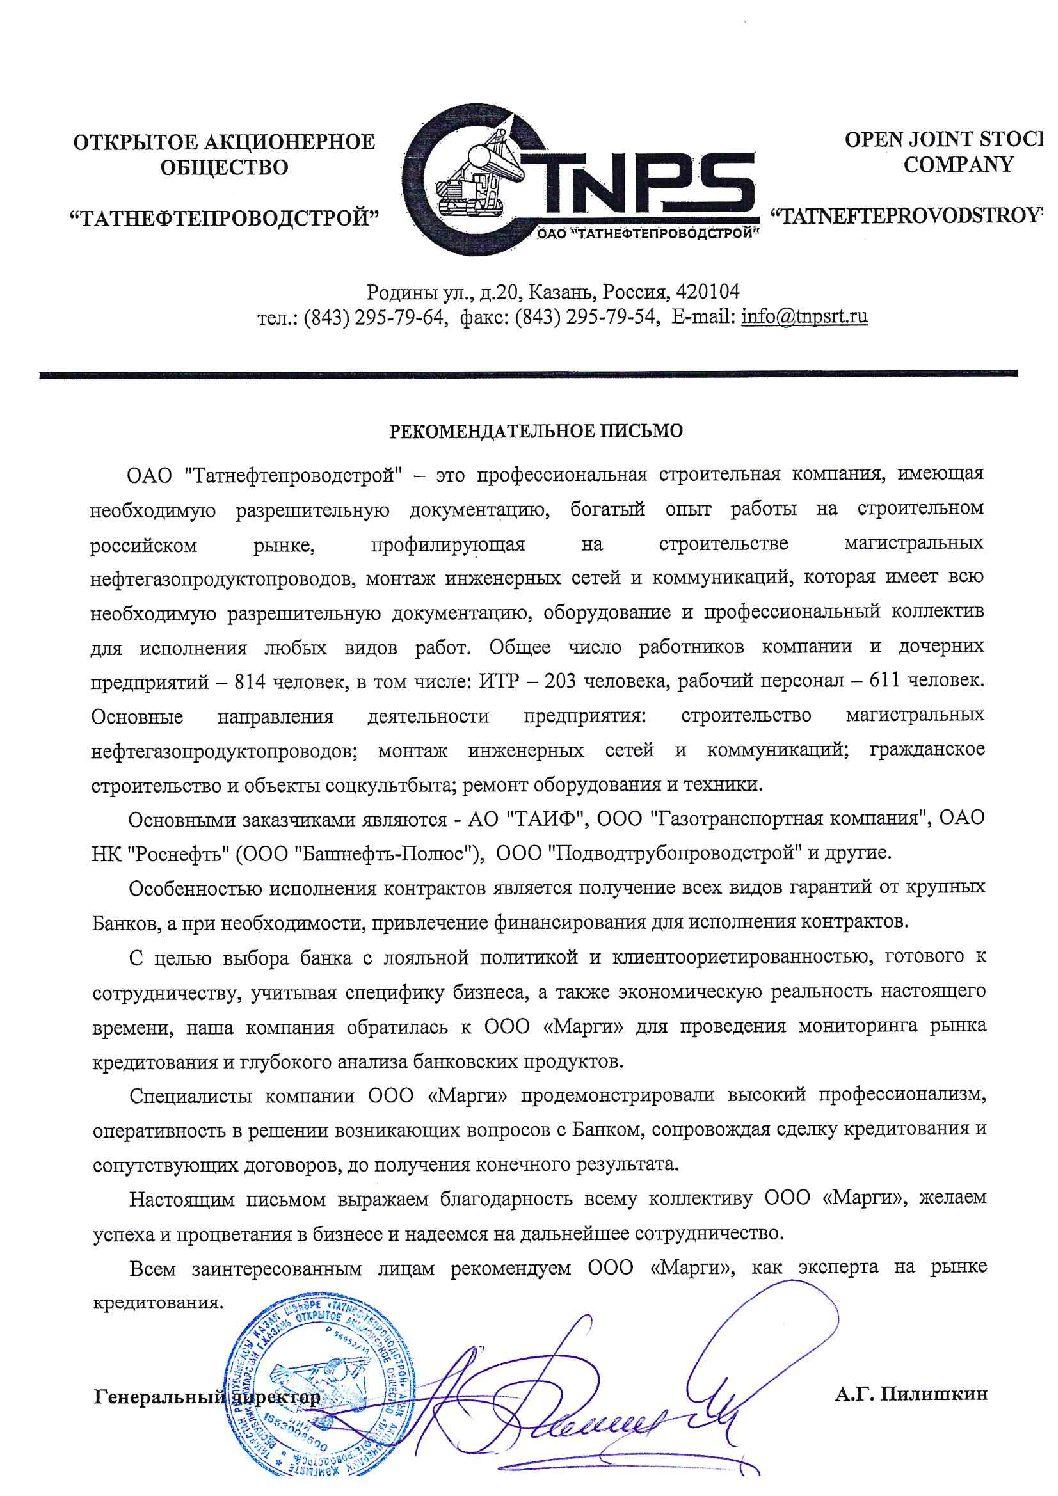 Tatnefteprodstroy_stroy_truby_gaz